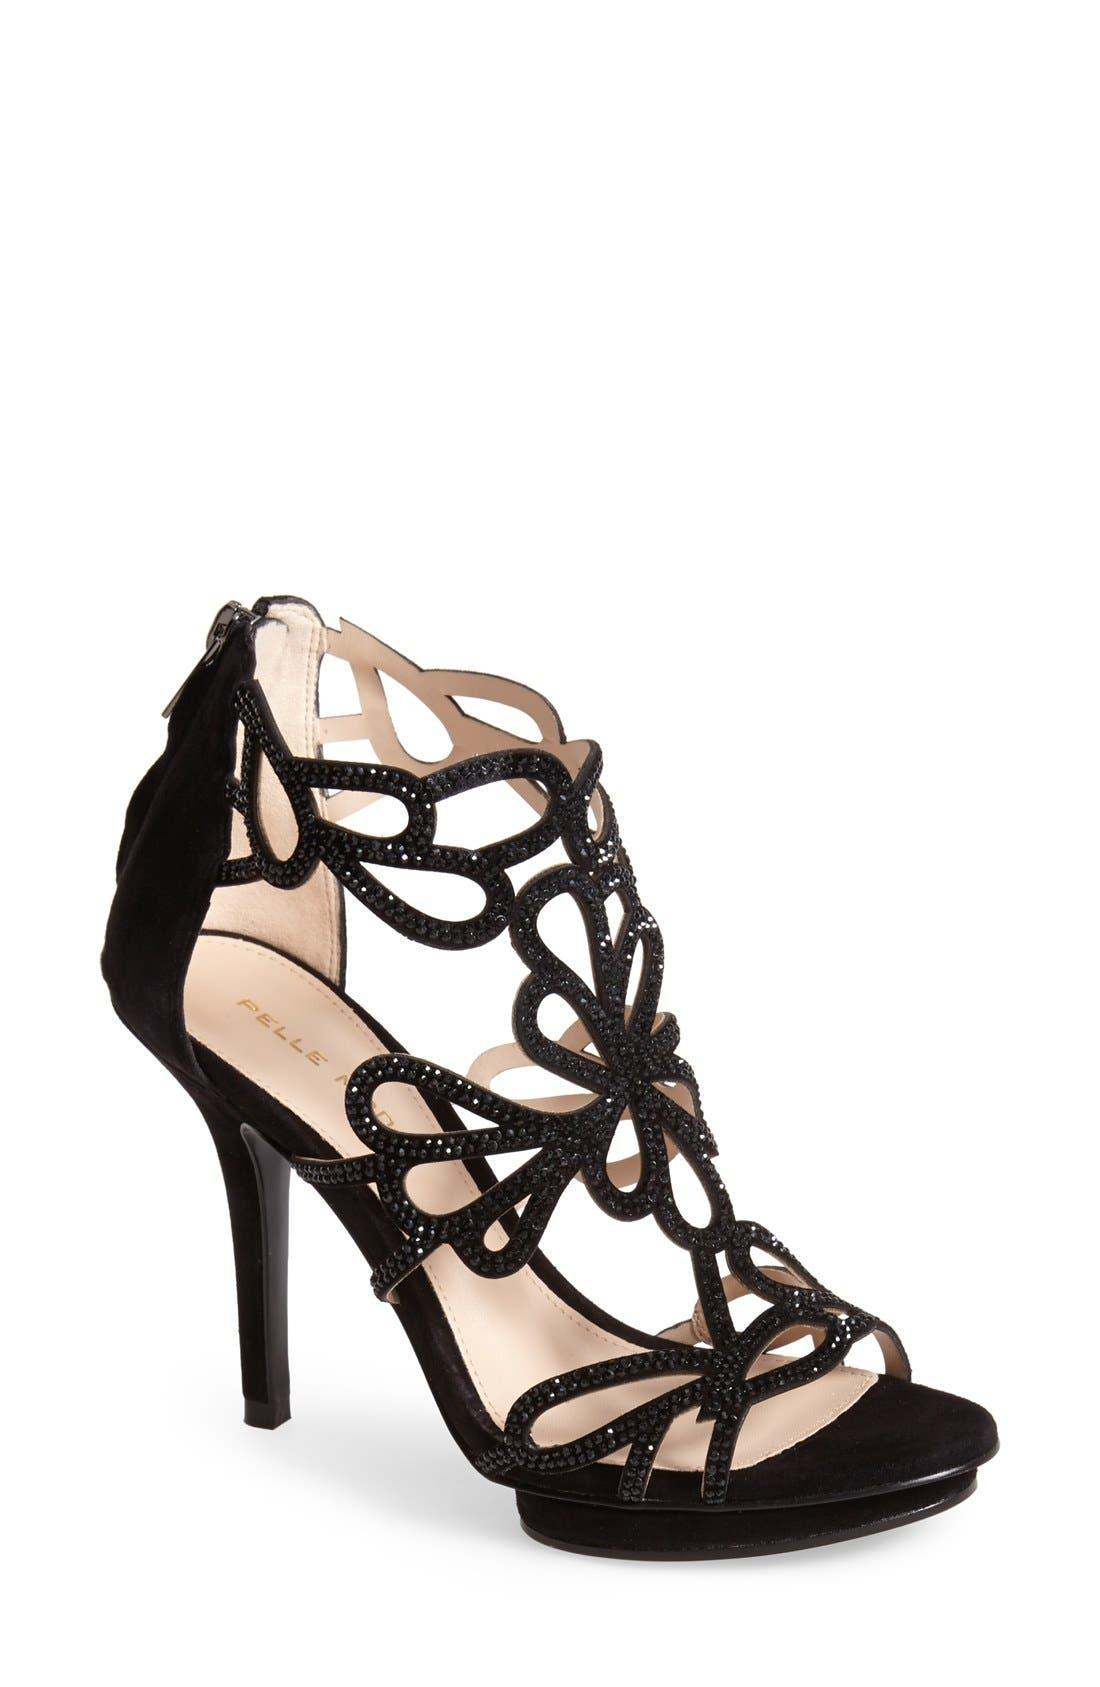 Main Image - Pelle Moda 'Ripley' Suede Platform Sandal (Women)